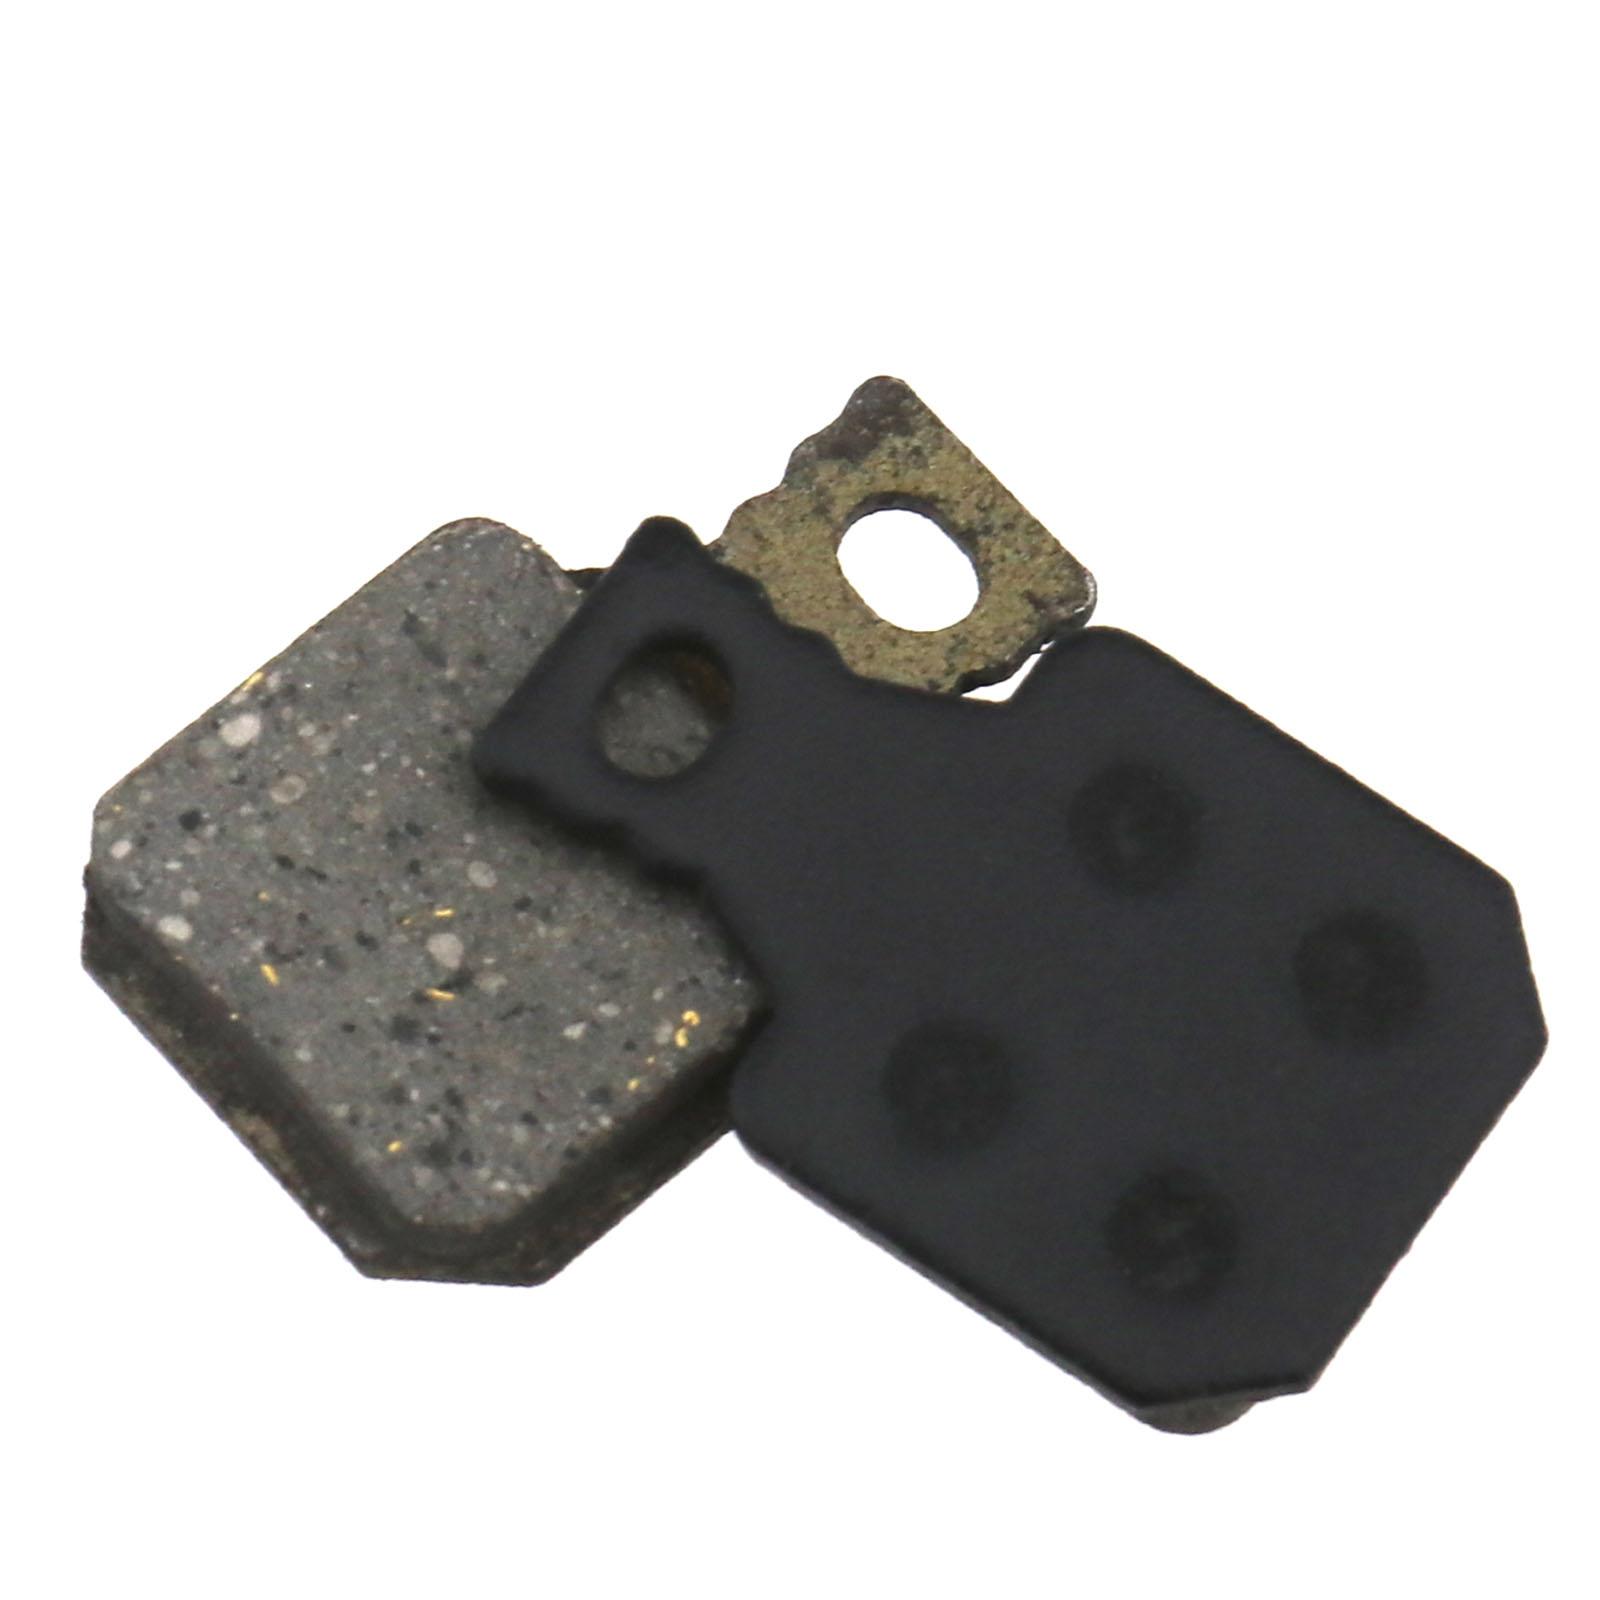 12pcs Replacement Semi-Metallic Bicycle Disc Brake Pads Fit For Magura MT5 MT7